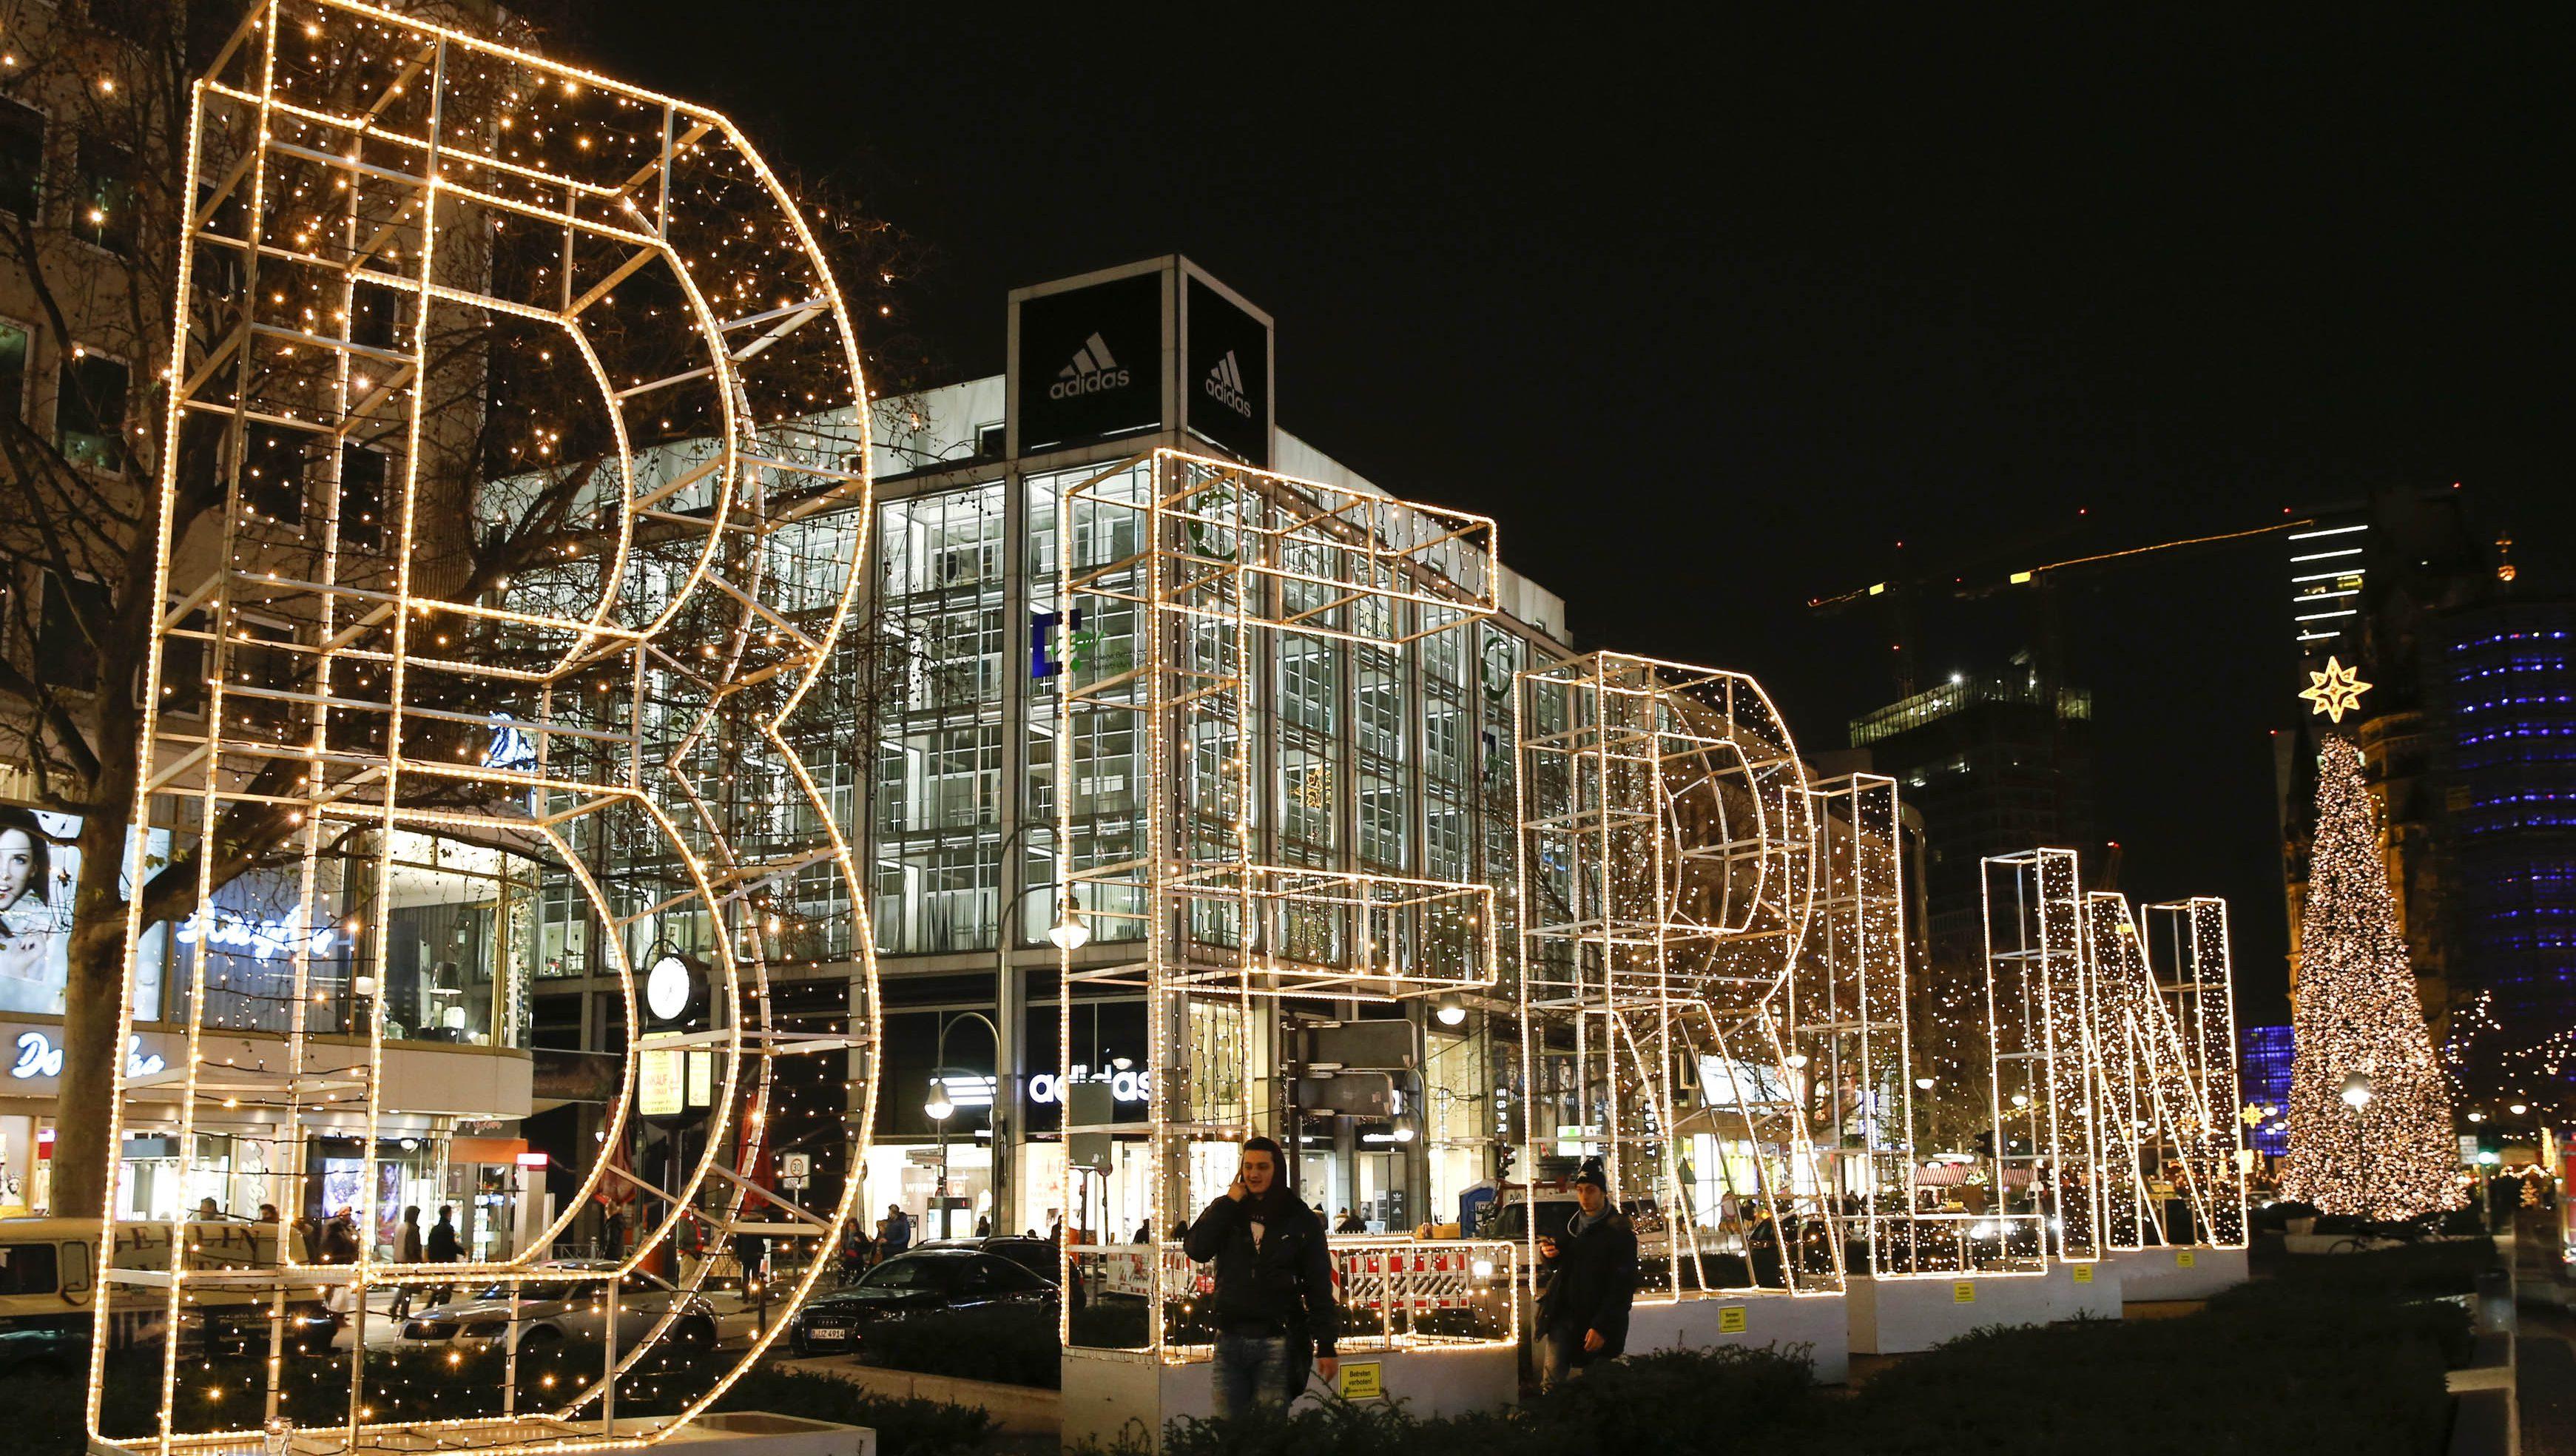 People walk past Christmas illuminations at the main shopping street Kurfuerstendamm in Berlin, Germany,